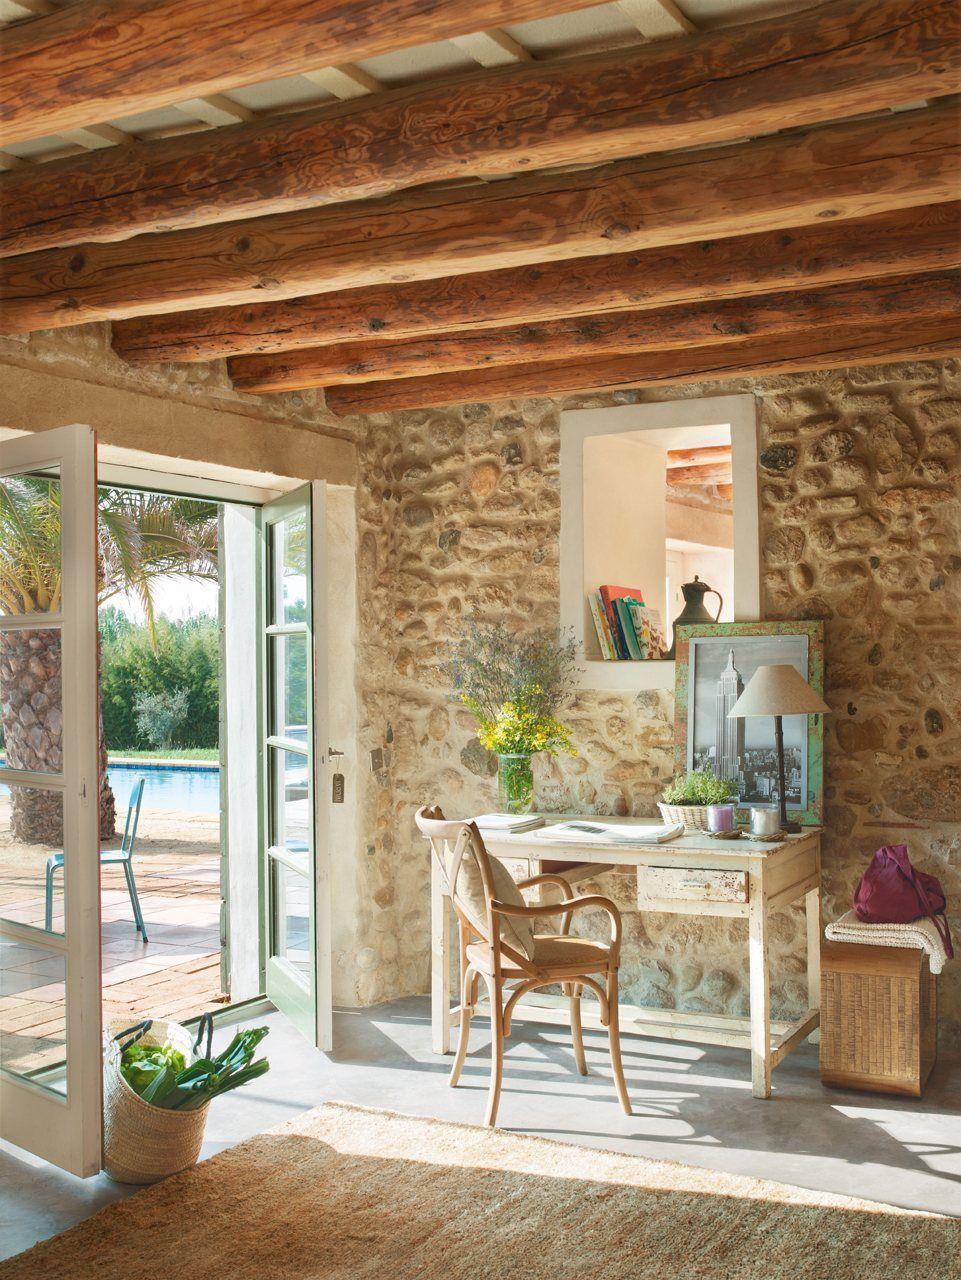 29 Living Room Interior Design: 29 Awesome Rustic Italian Living Room Design Ideas